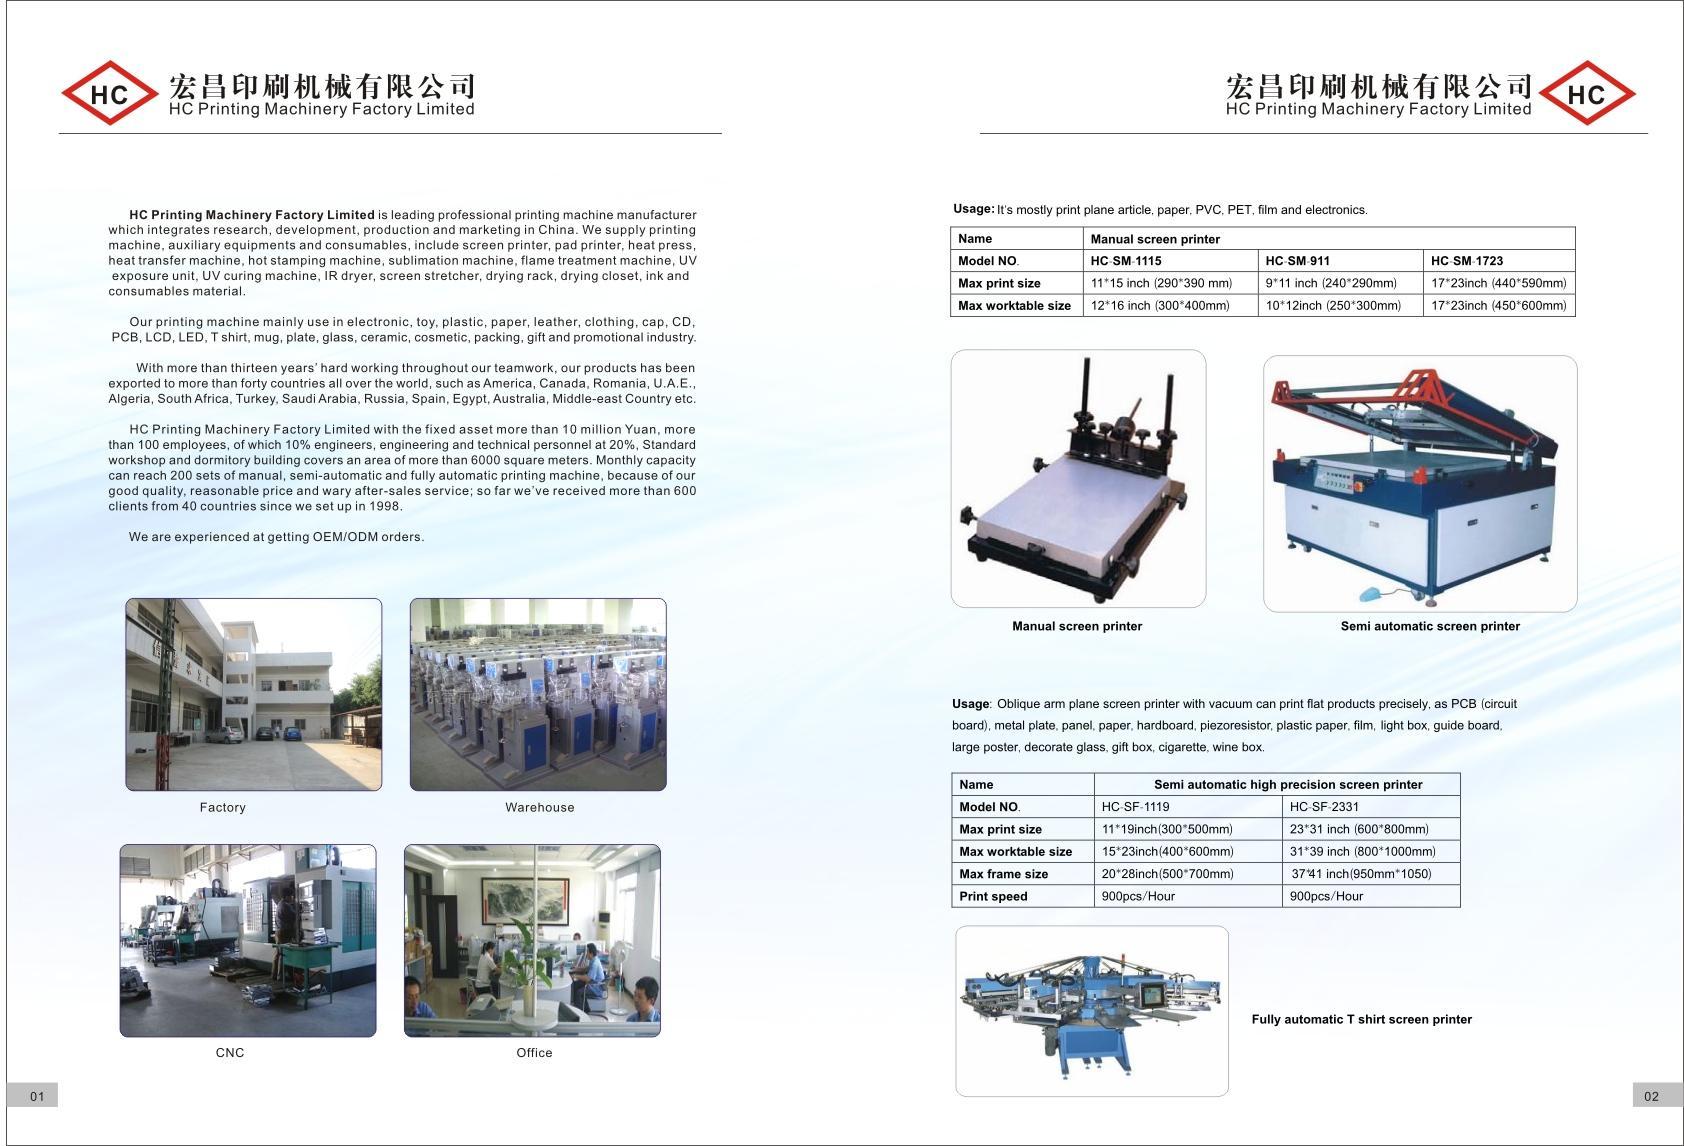 screen printer, pad printer, hot stamp machine, heat transfer machine, sublimat 5